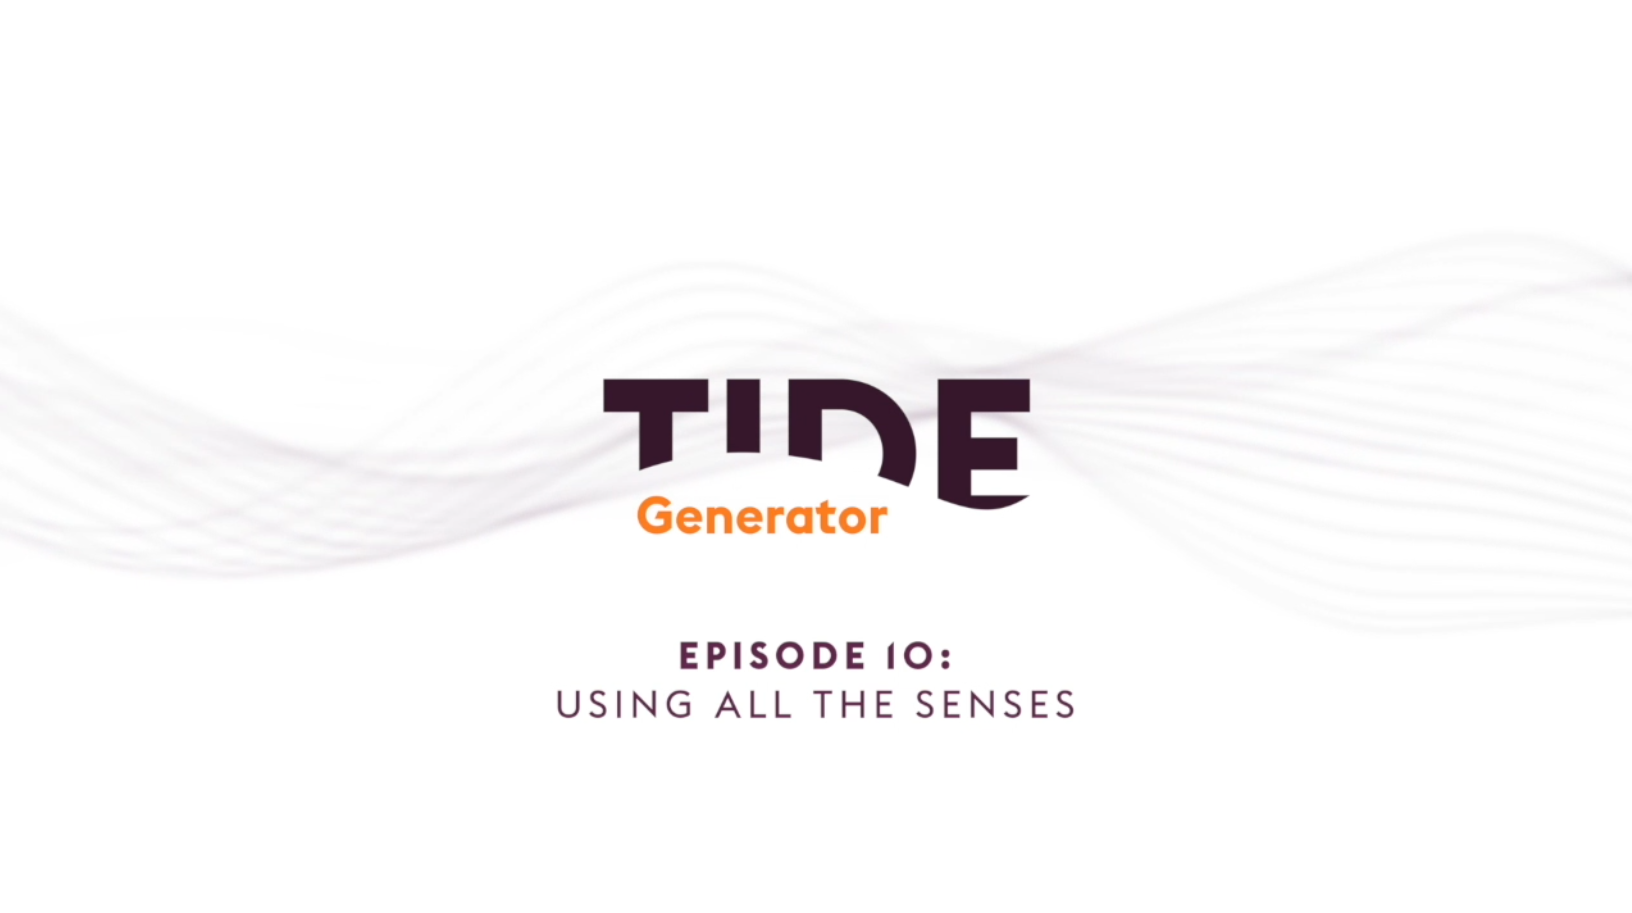 TIDE Generator Podcast Episode 10   AVIXA